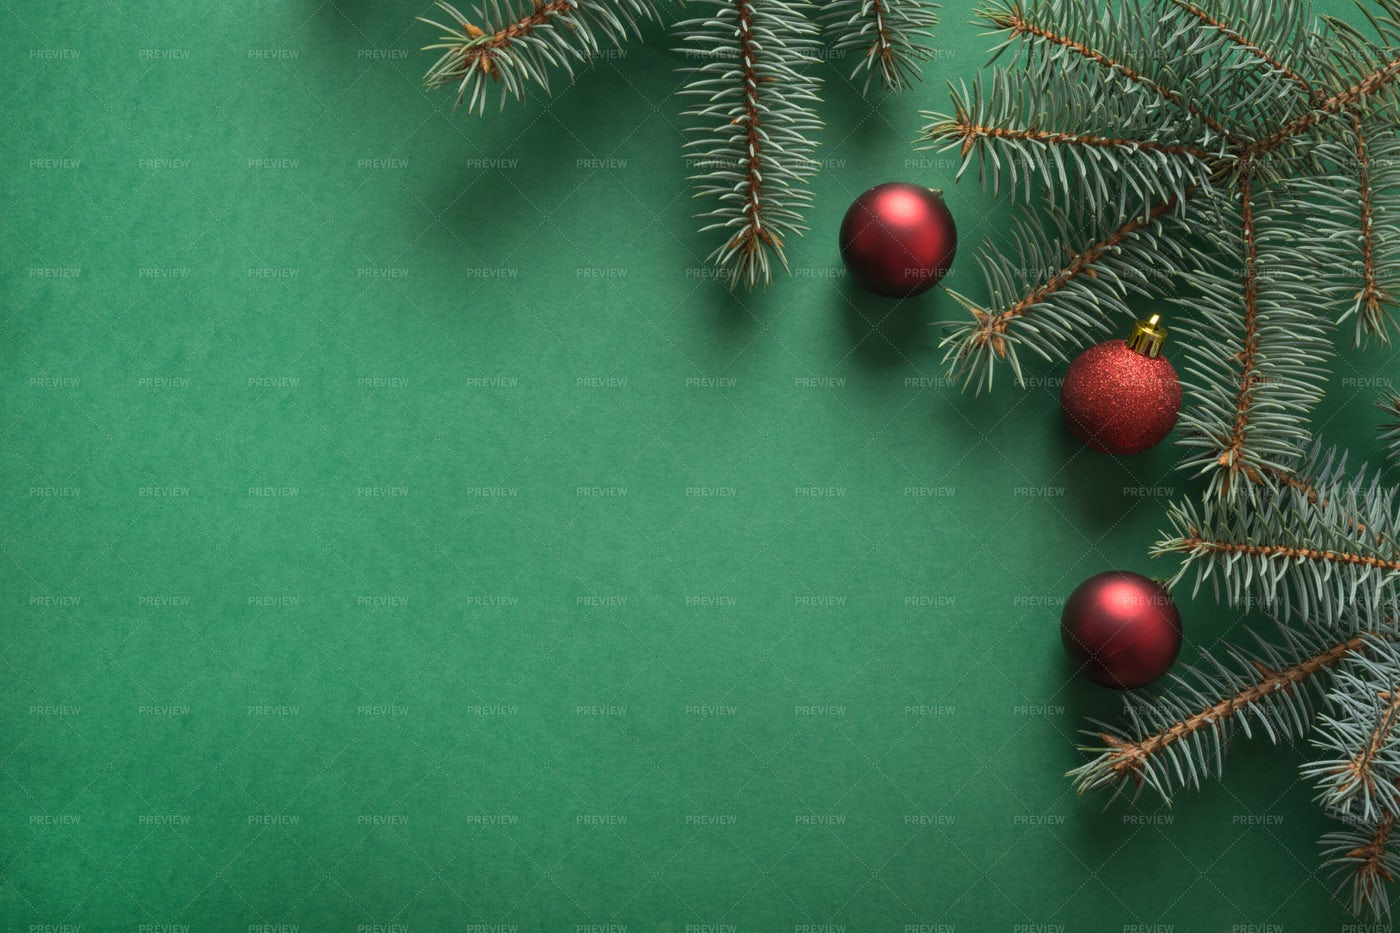 Christmas Tree Branches: Stock Photos